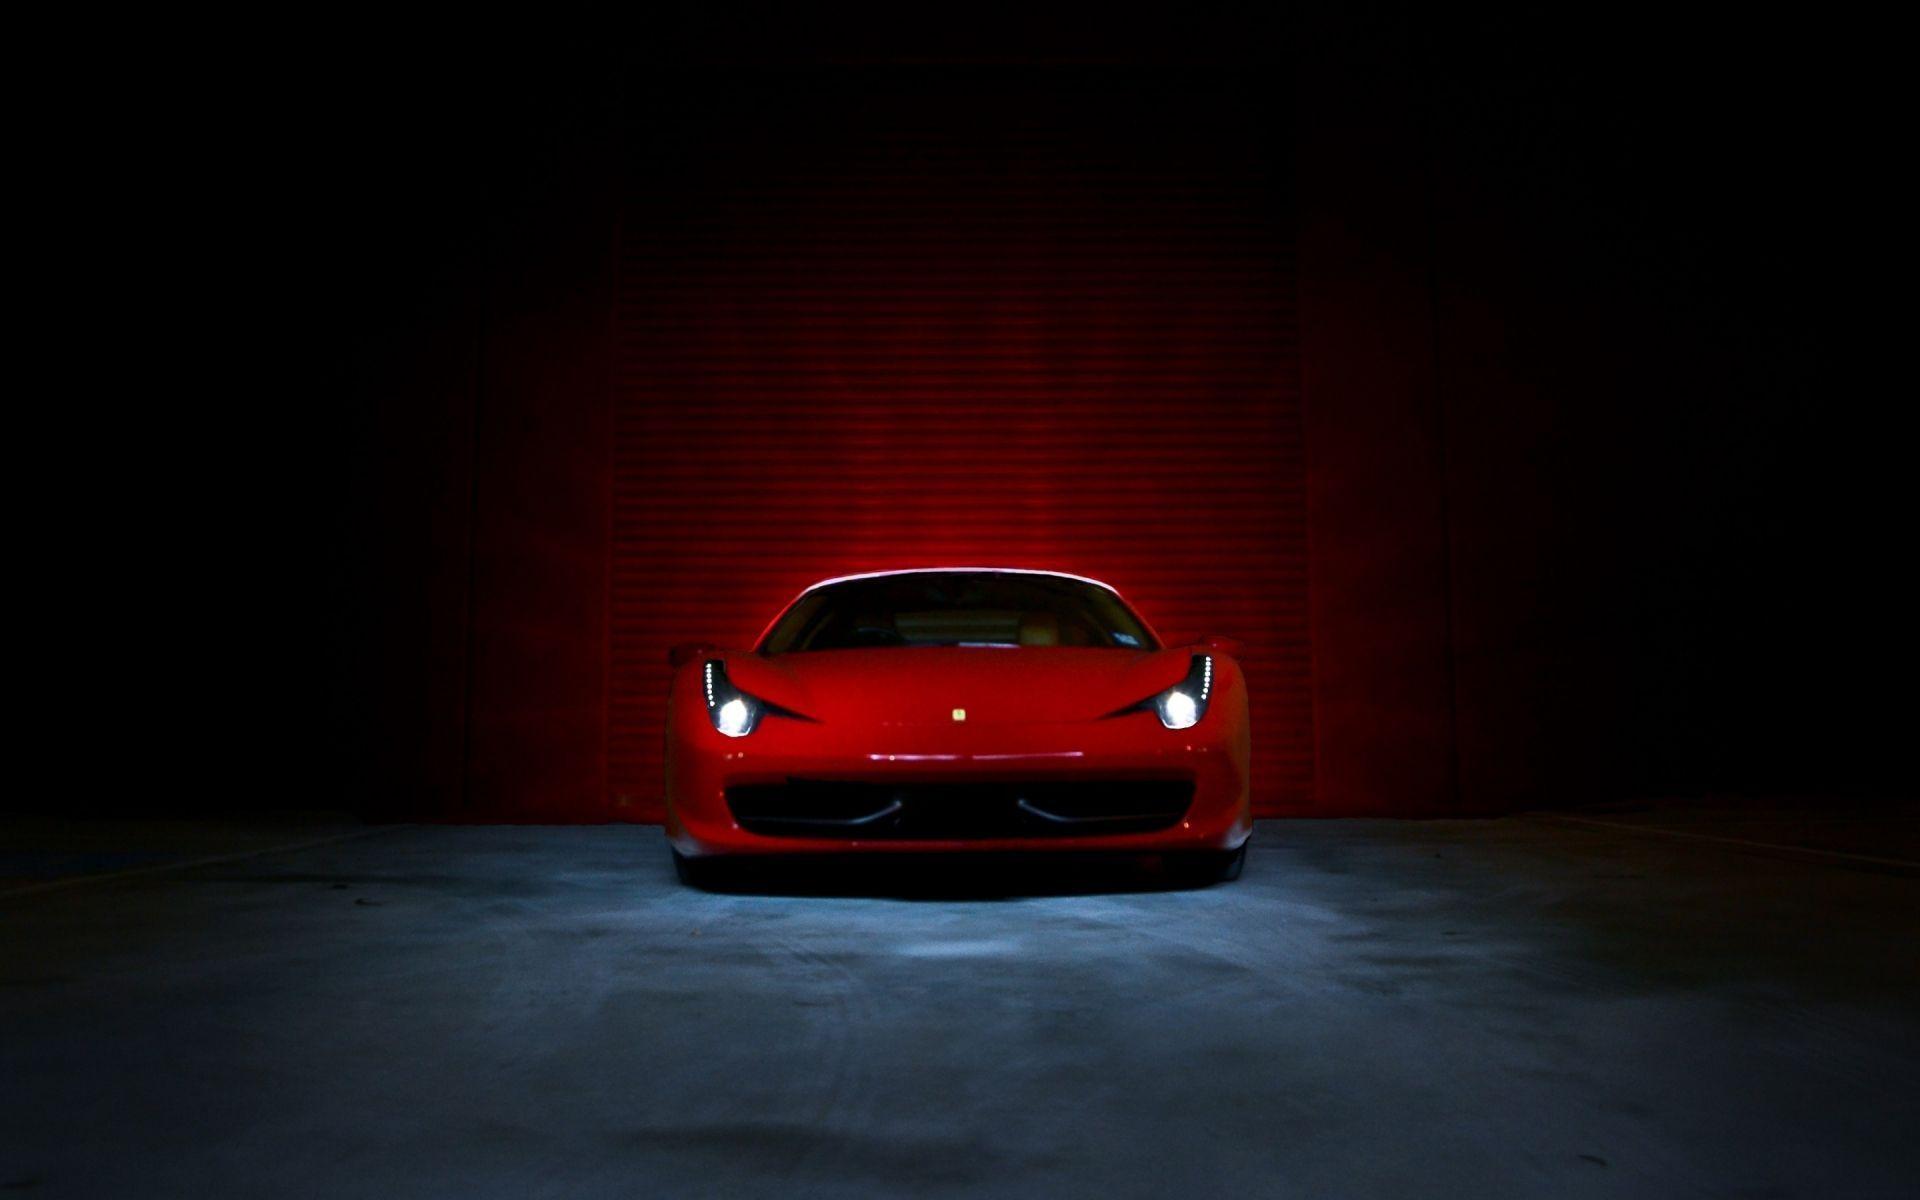 2017 Ferrari 458 Italia Wallpapers 1920x1200